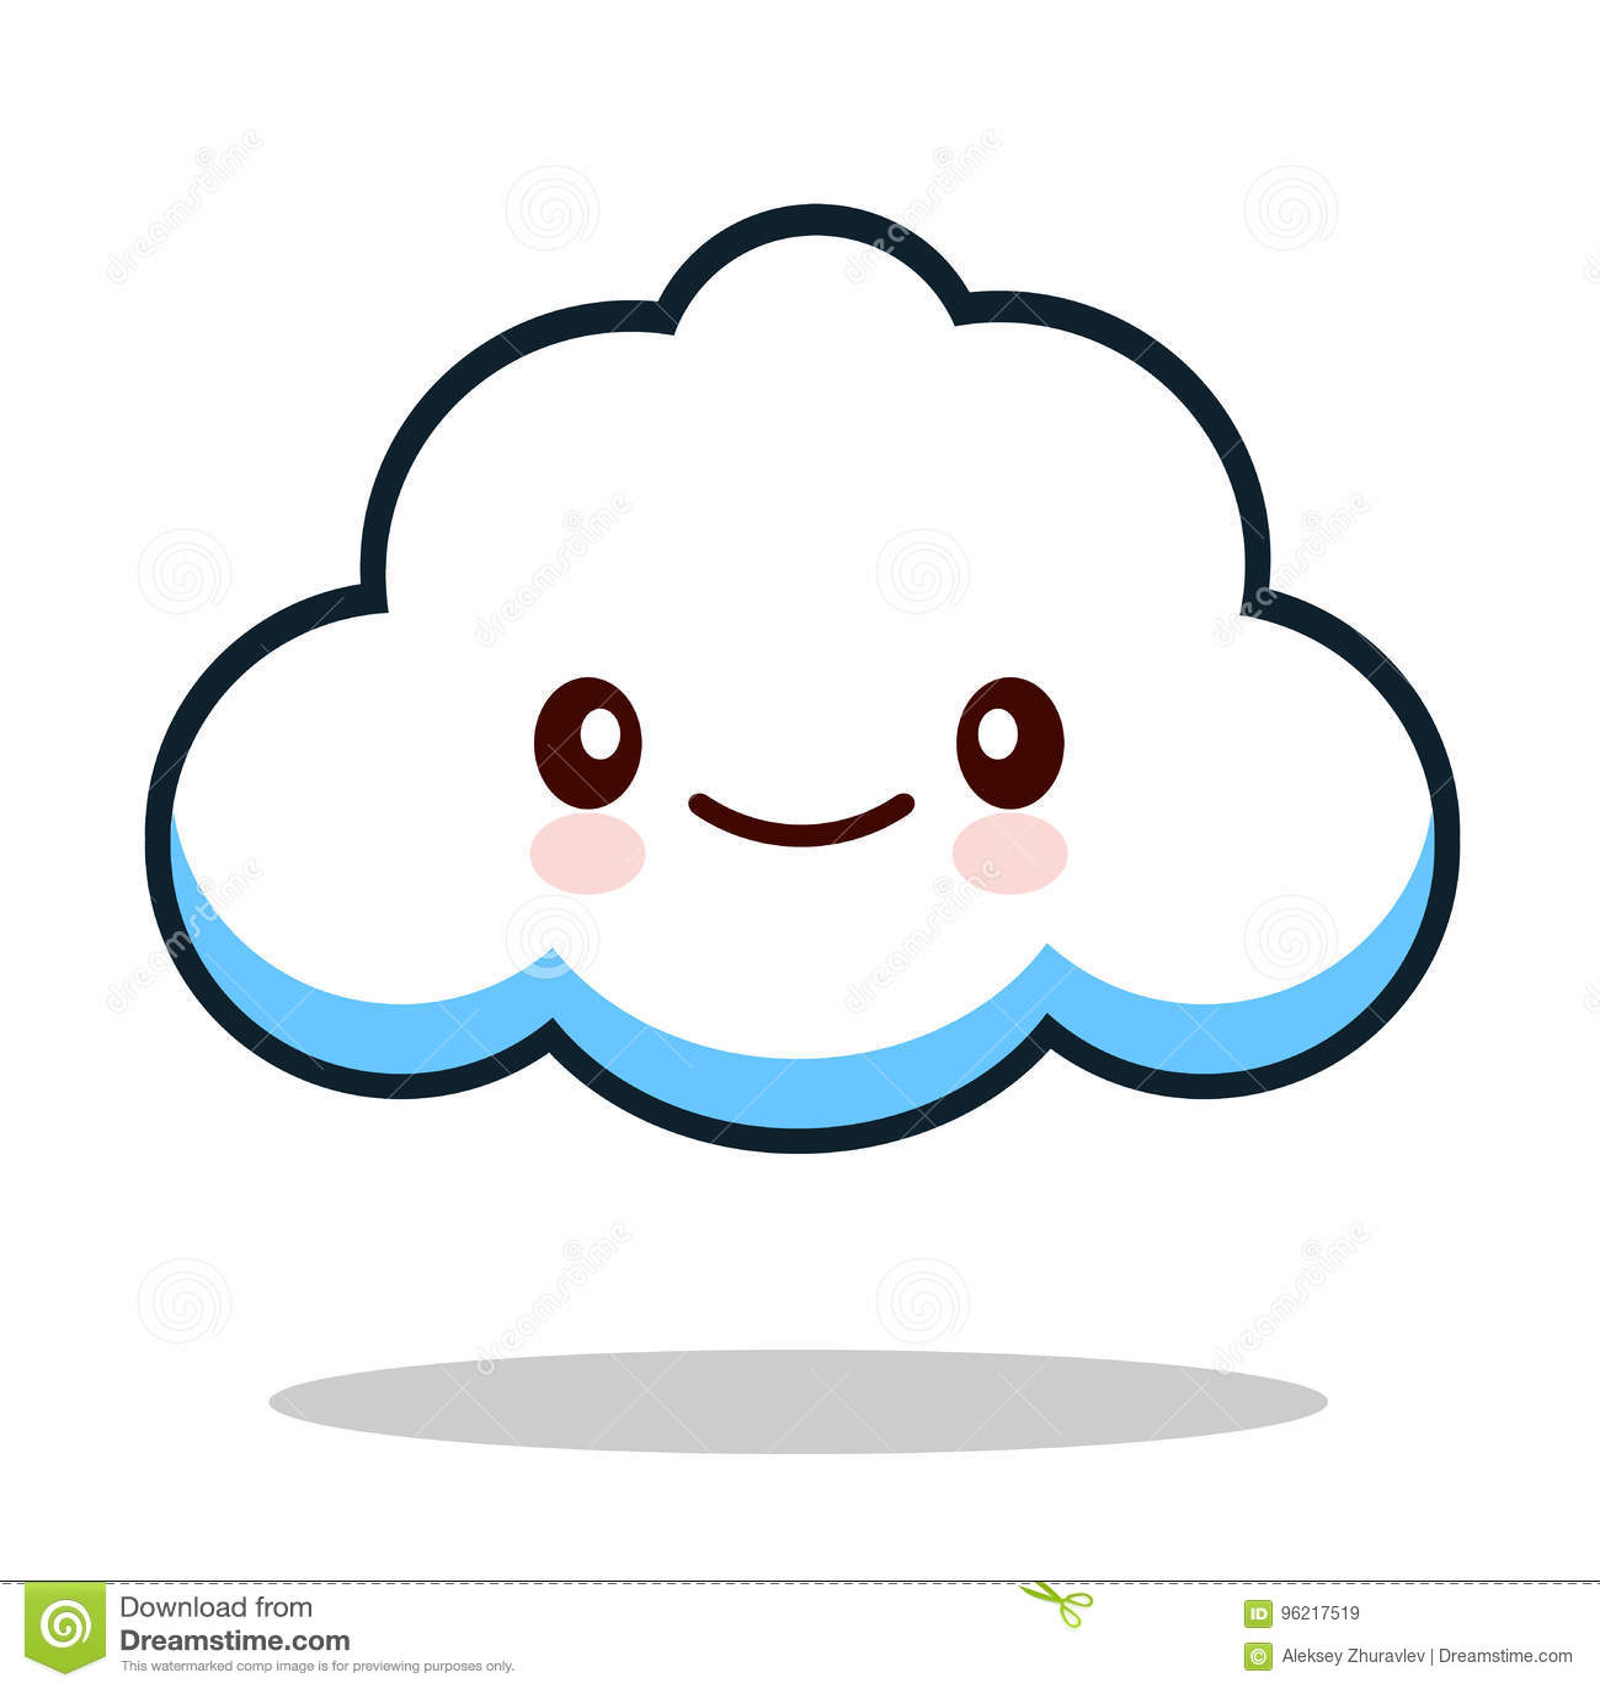 Kawaii Cartoon White Emoticon Cute Cloud Stock Vector